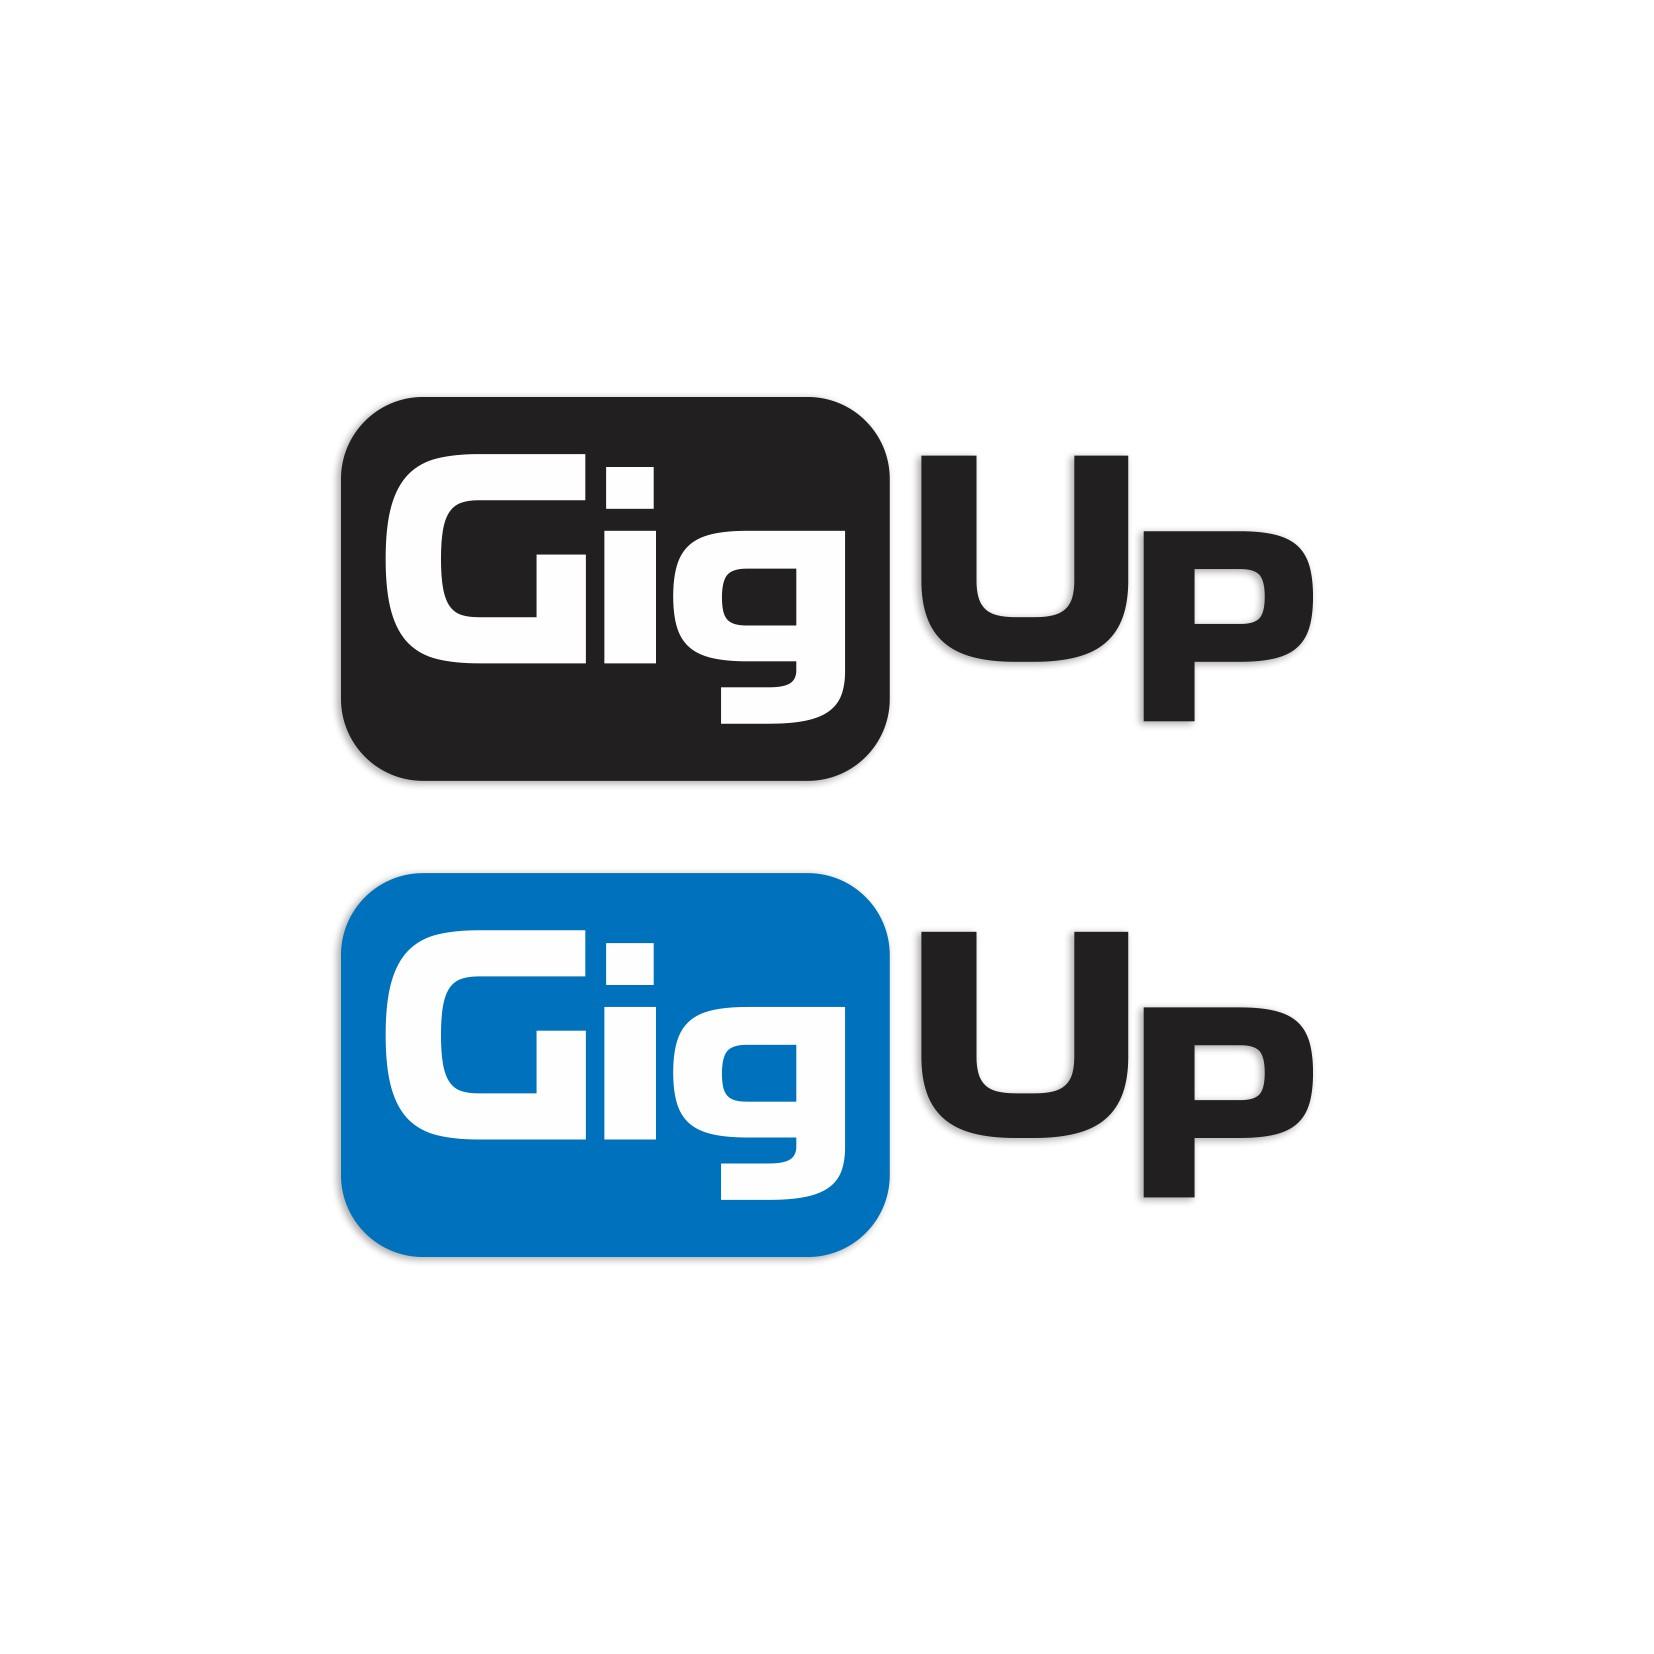 Tech startup needs a new attractive logo